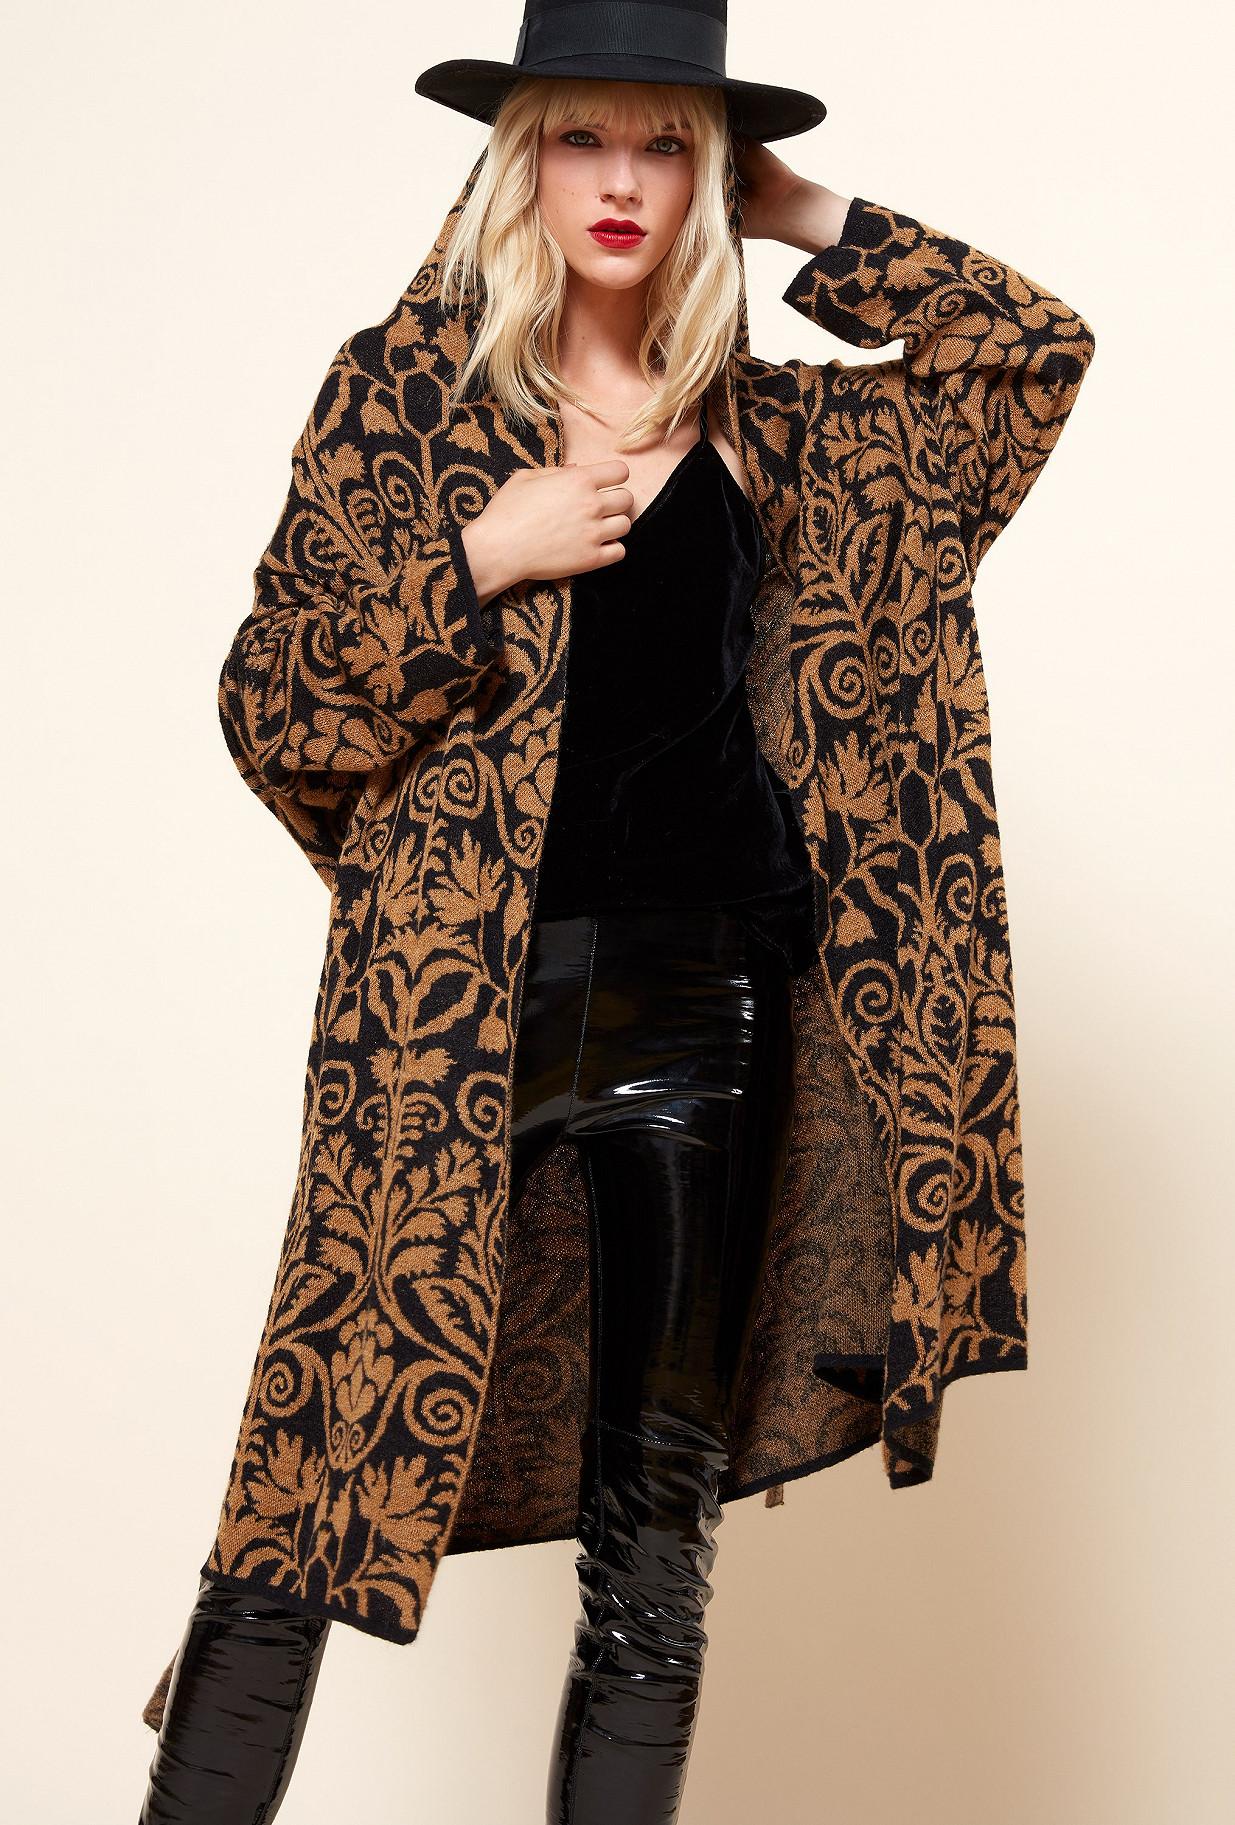 clothes store COAT  Yetha french designer fashion Paris